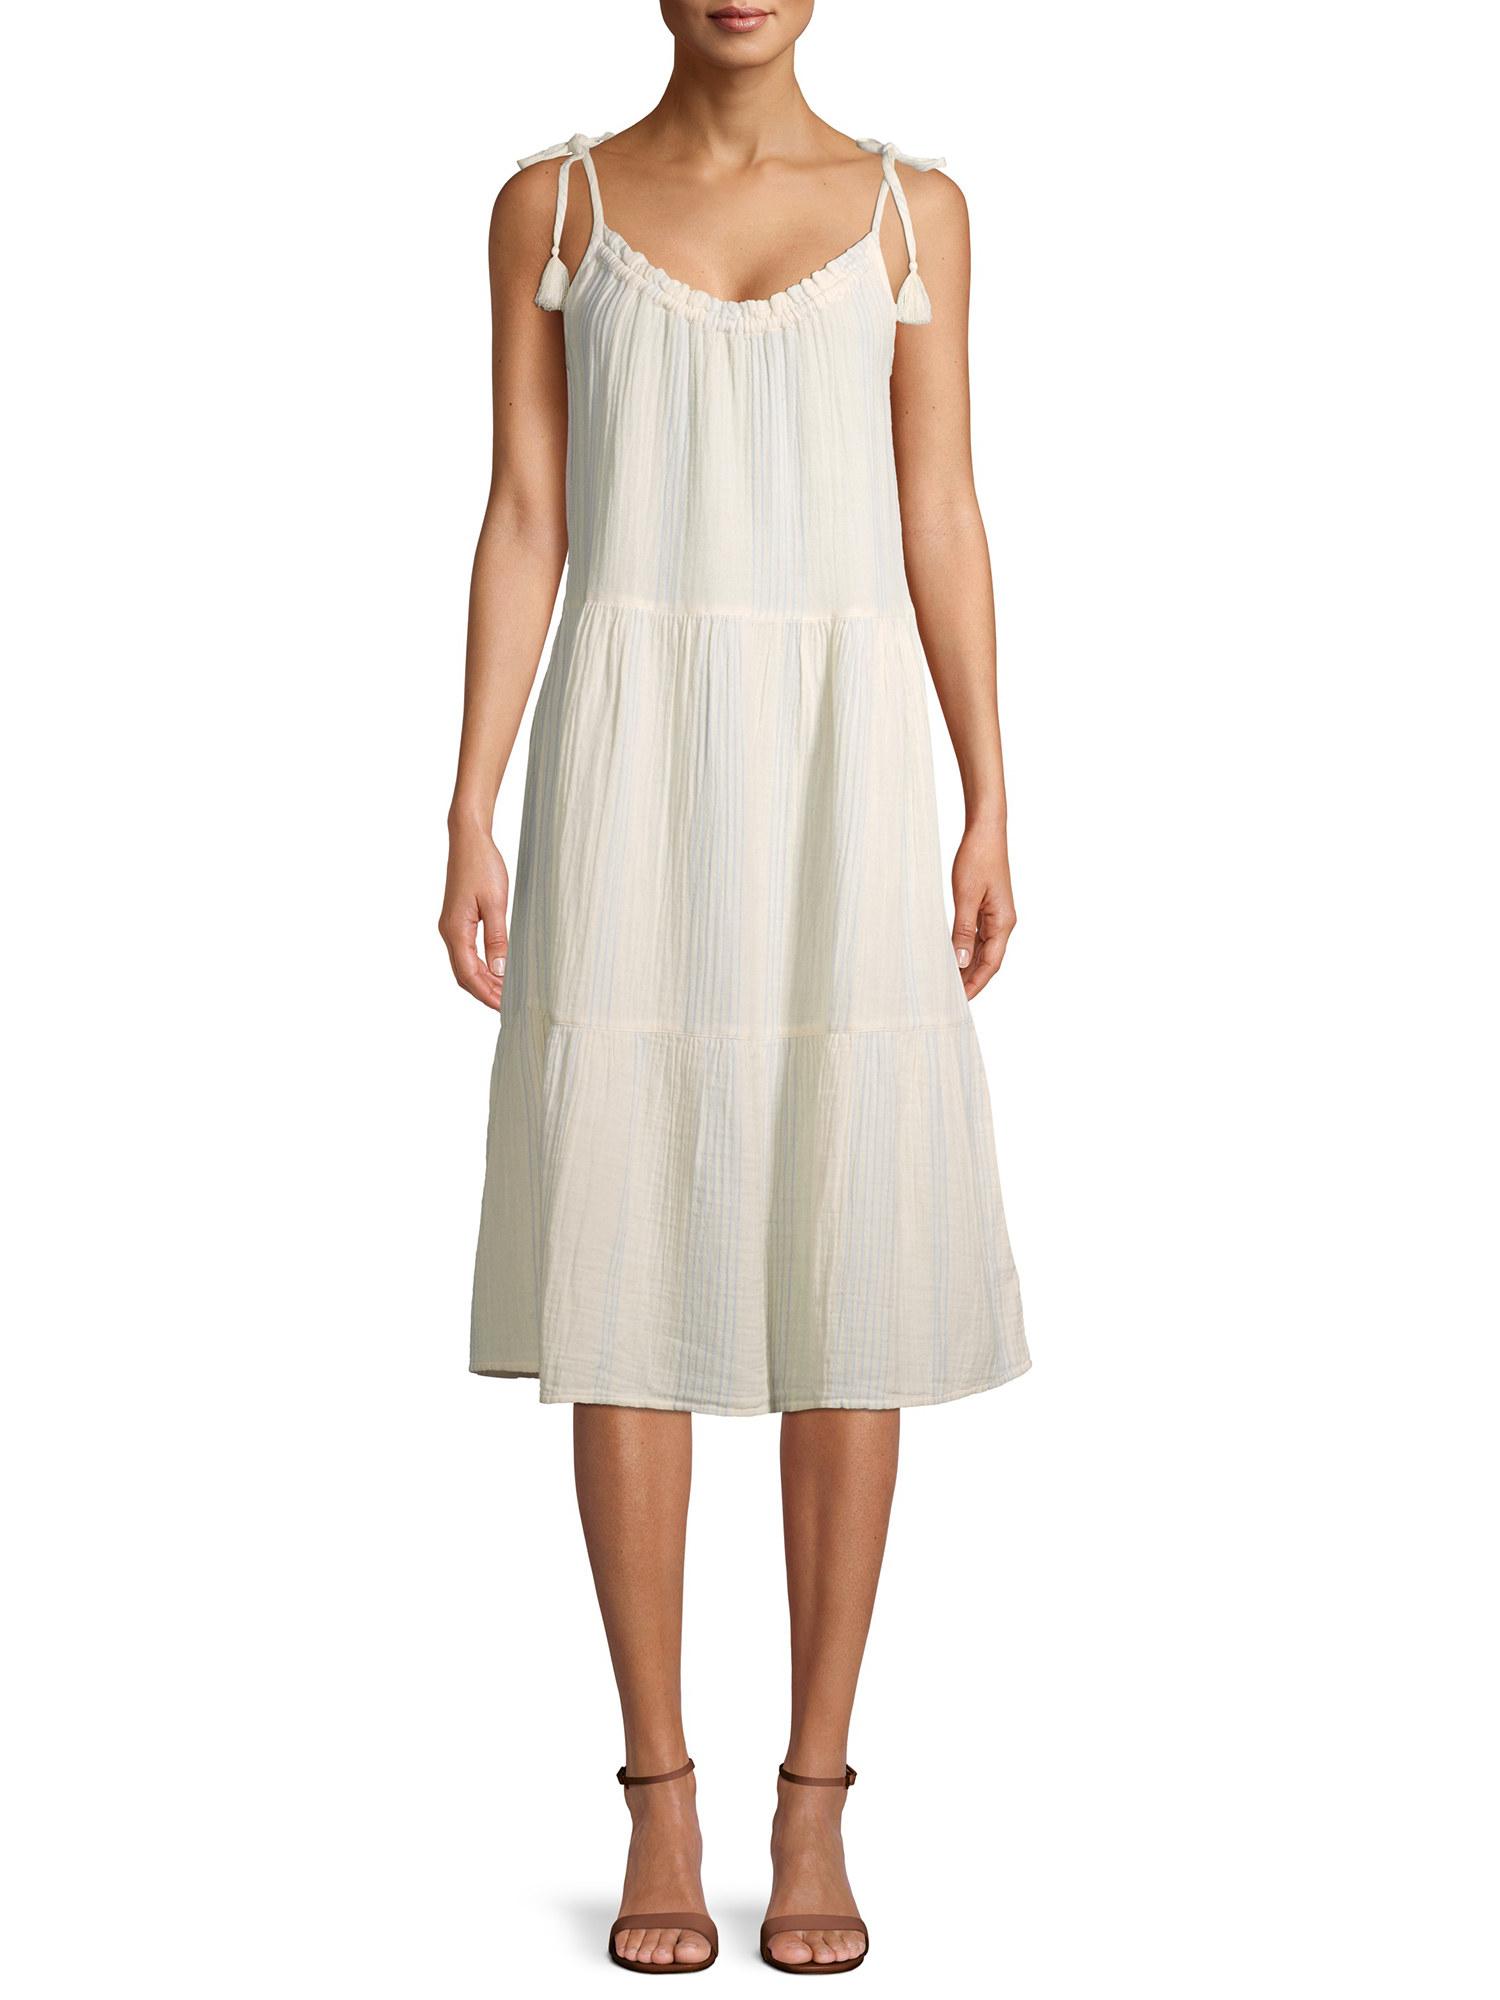 model in an ivory sleeveless midi dress